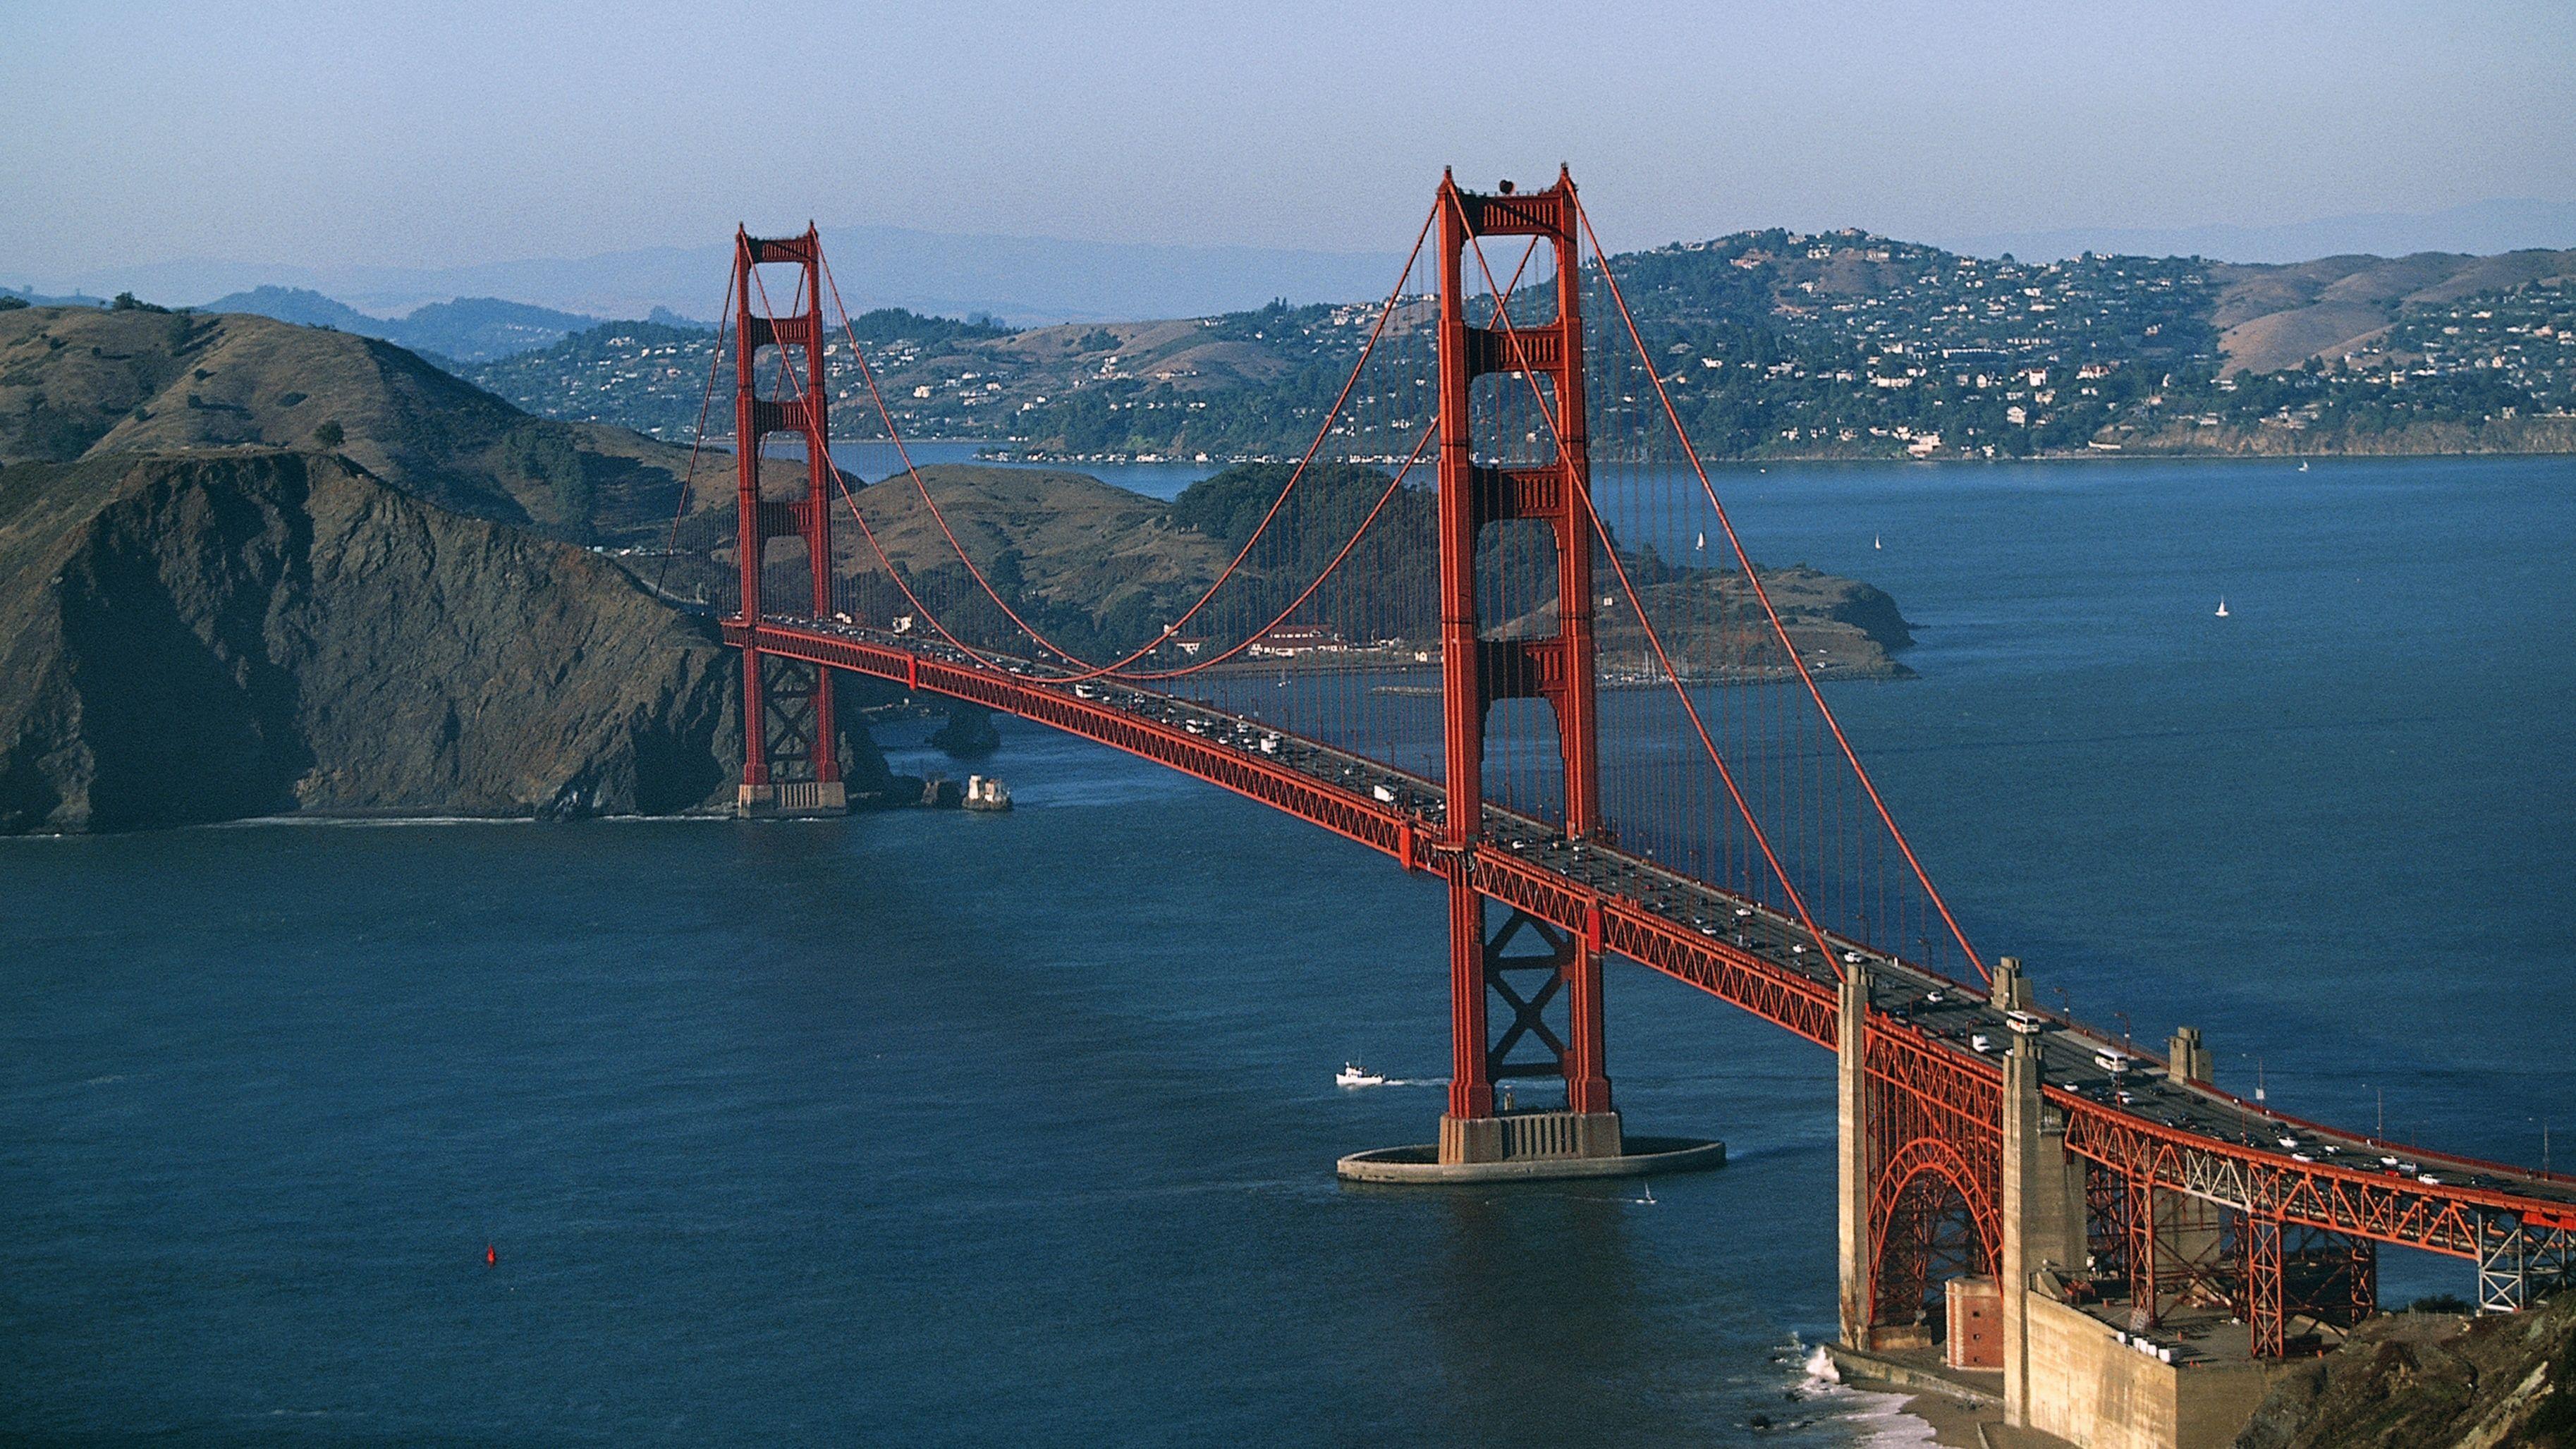 Daly city california san francisco golden gate bridge